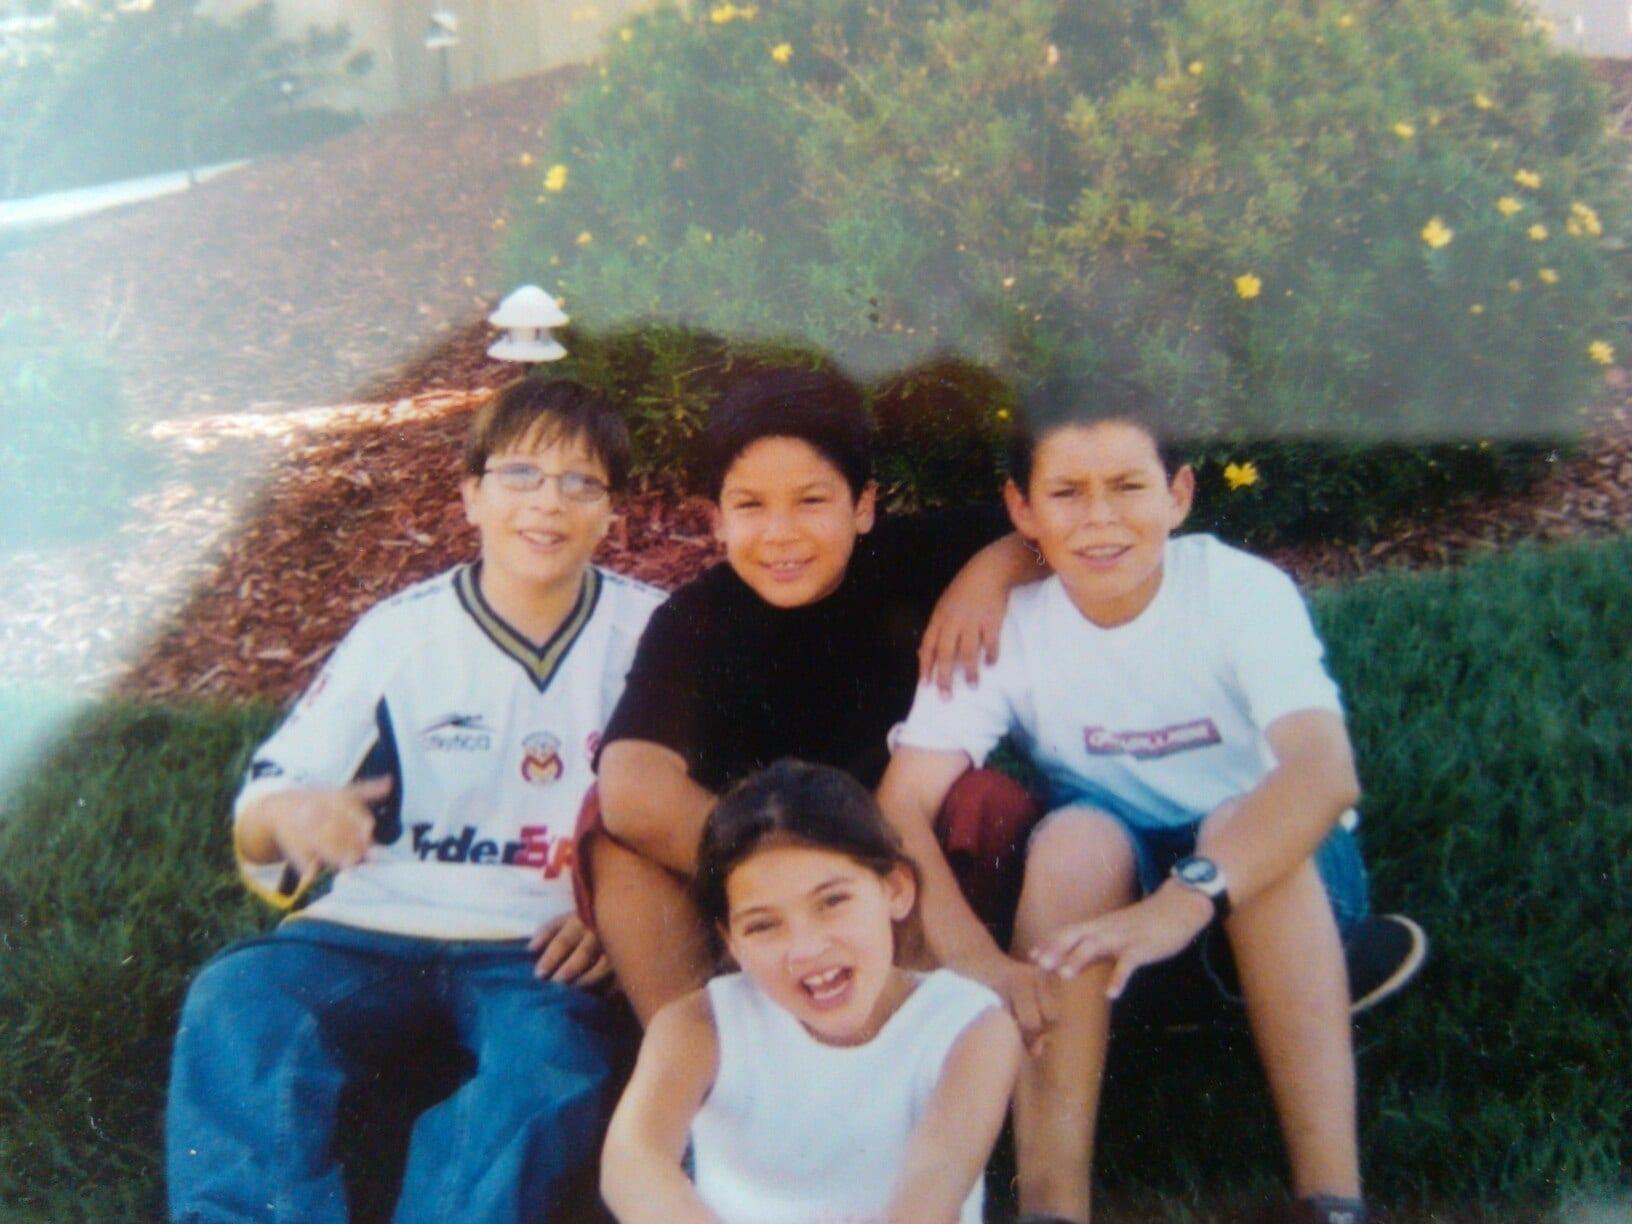 Jose Moreno, Javy Moreno, Anthony Moreno, and Samantha Moreno sitting on the grass